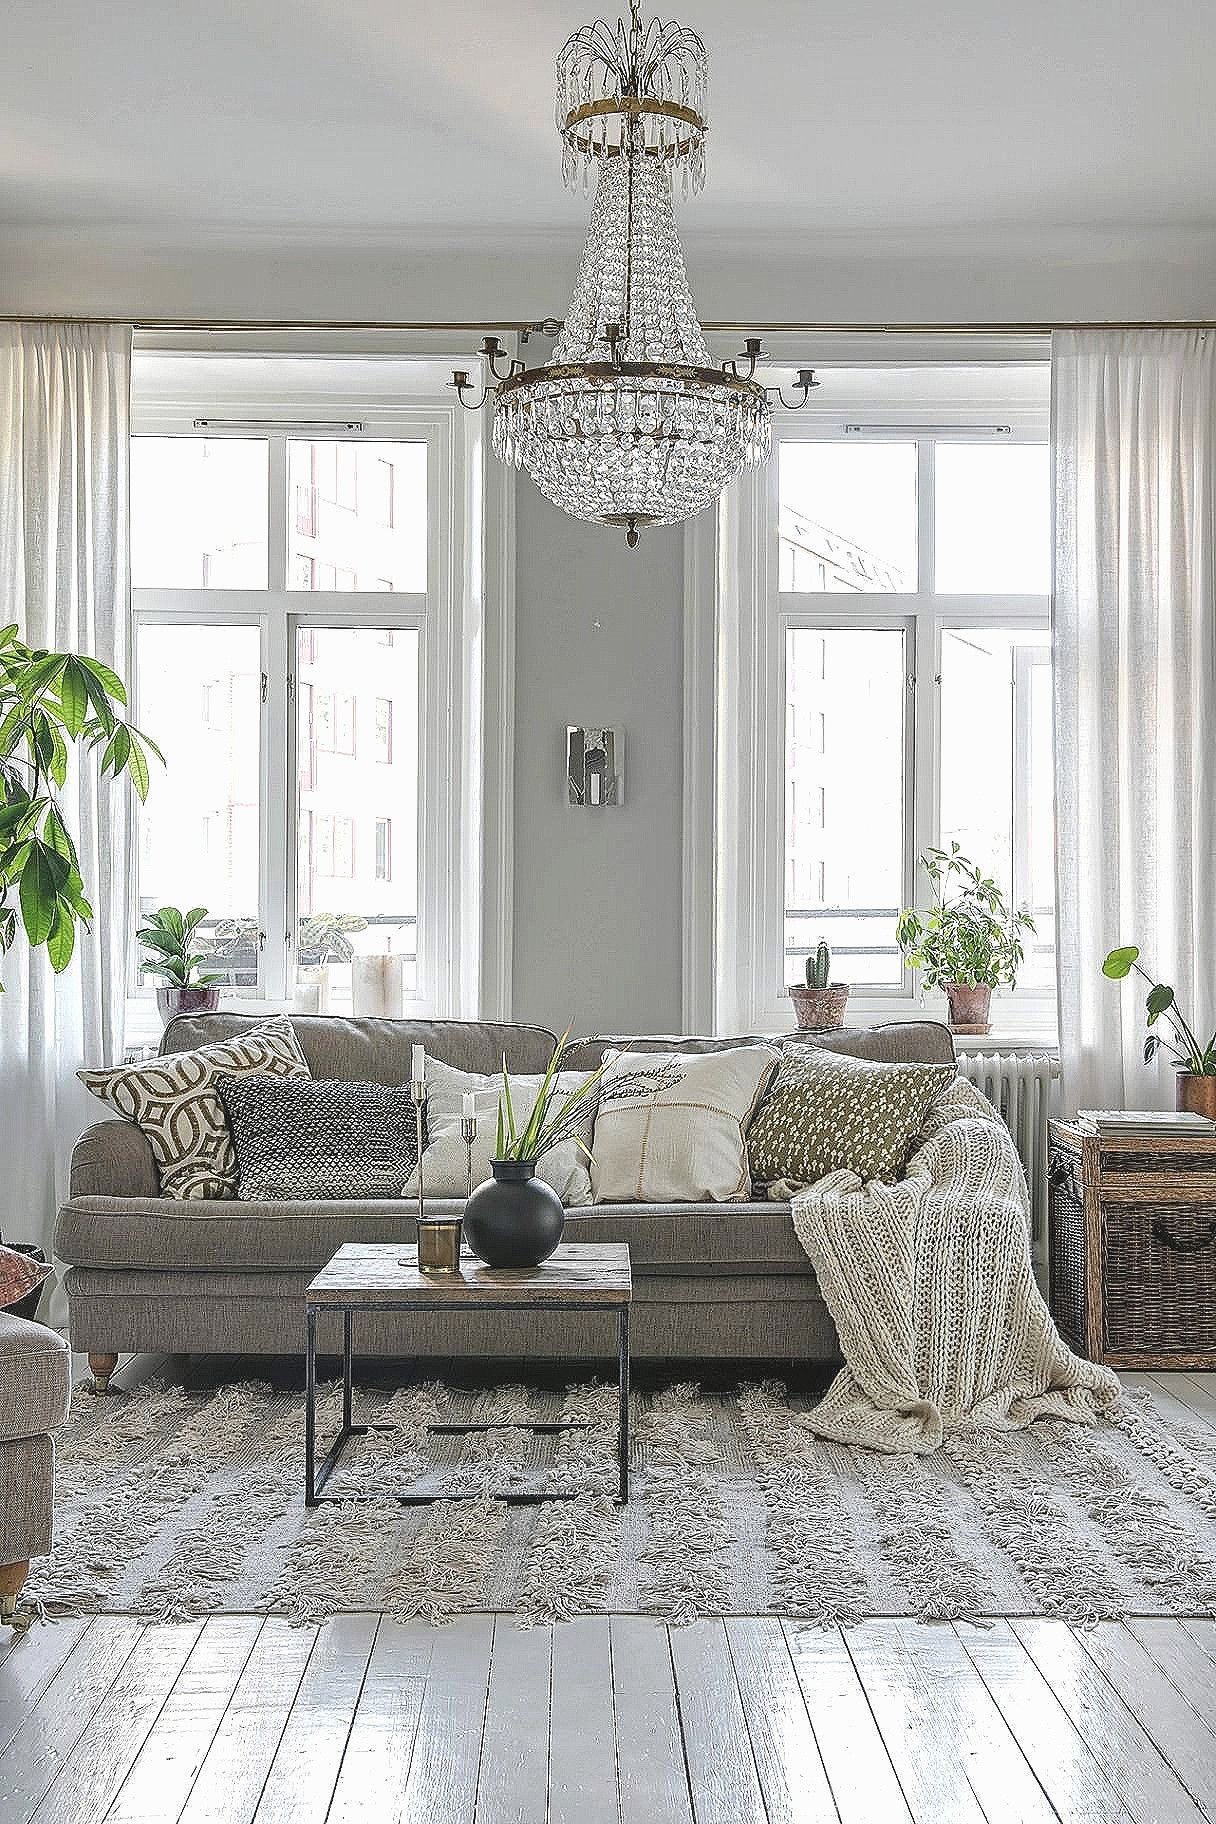 30 Attractive Hardwood Floor Decorating Ideas In 2020 Elegant Living Room Wall Decor Living Room Living Room Pictures